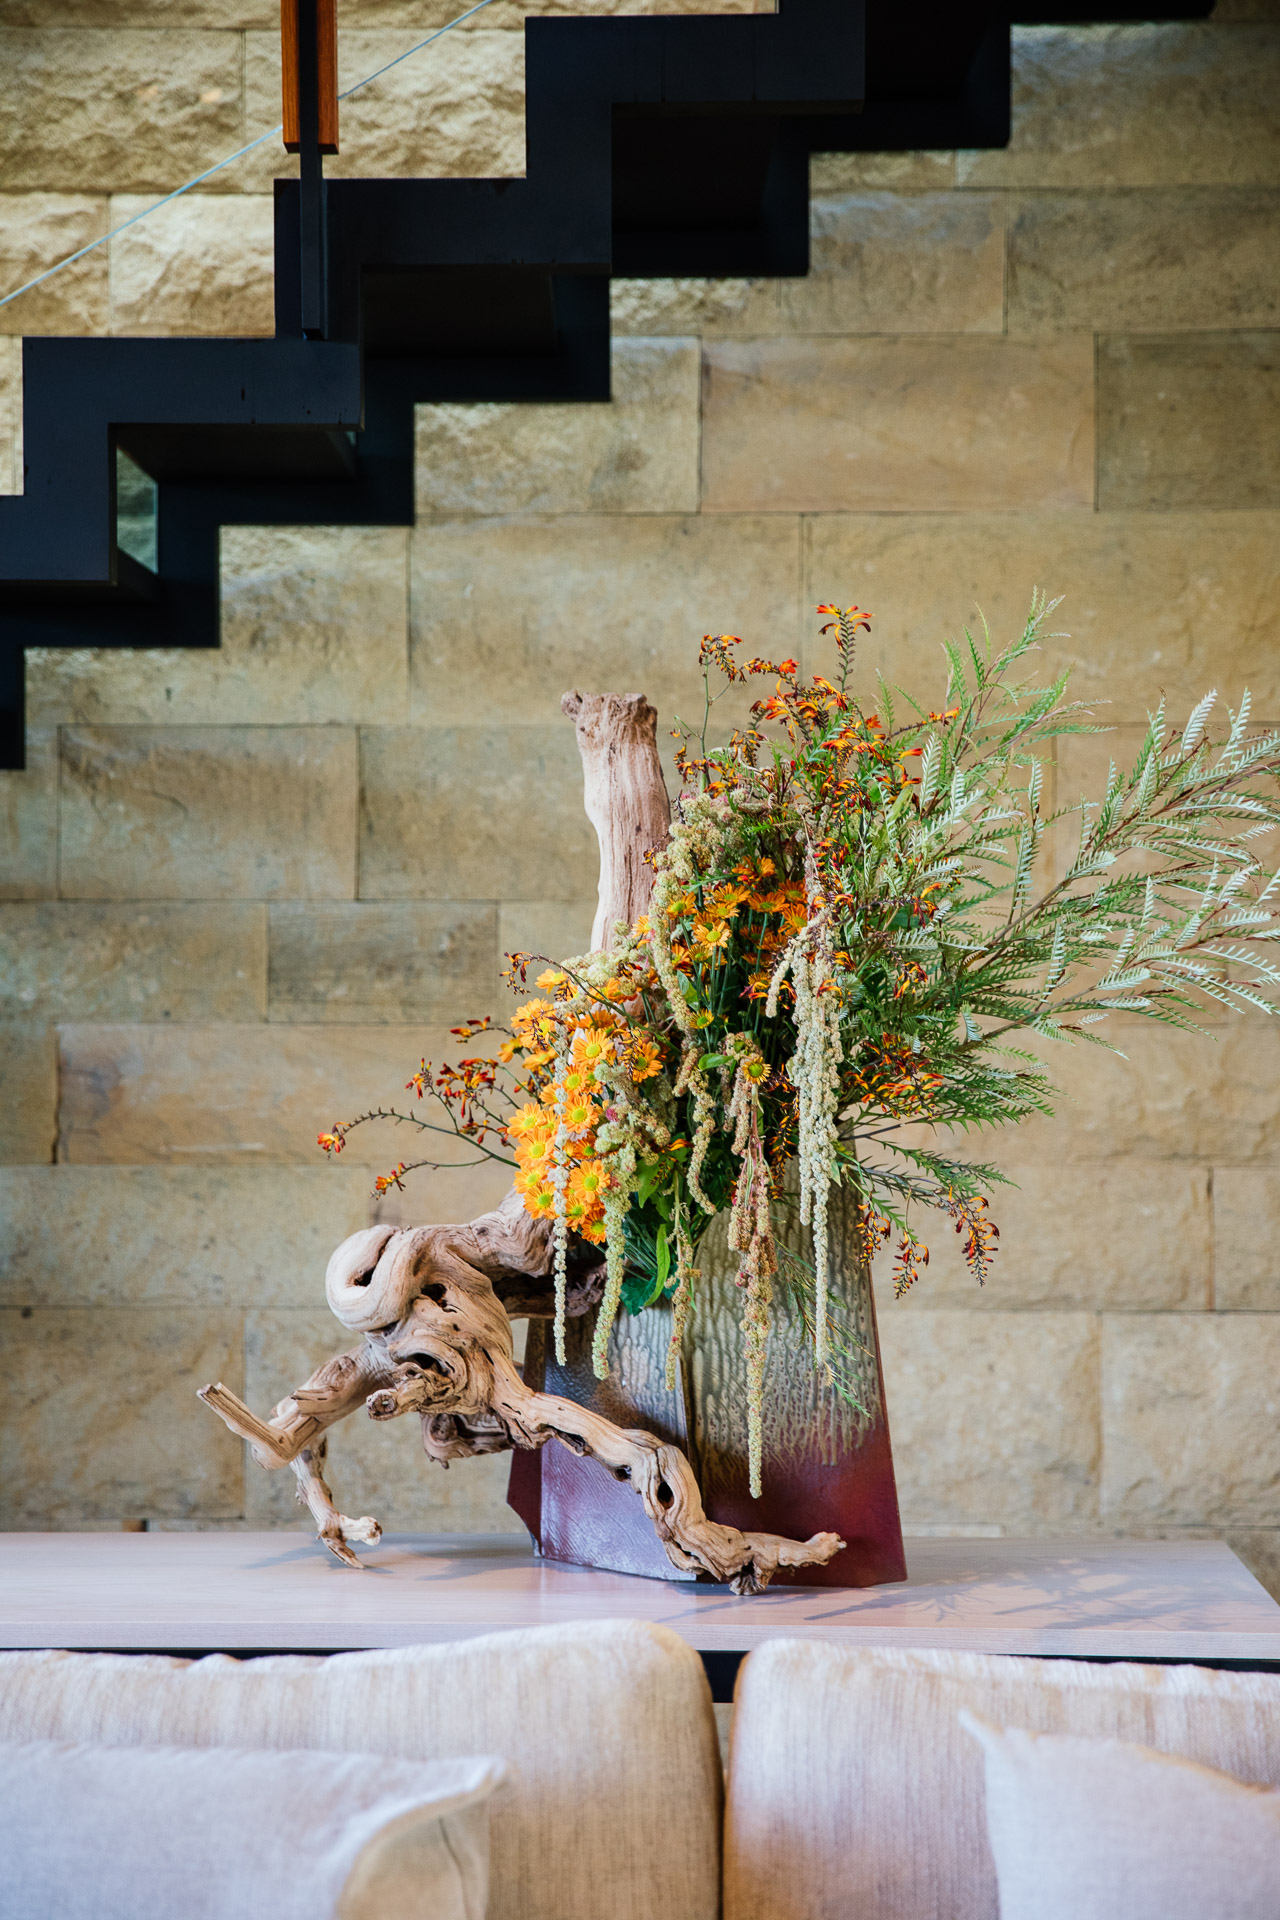 nobu-ryokan-malibu-california-luxury-hotel-photographer-los-angeles-6.jpg